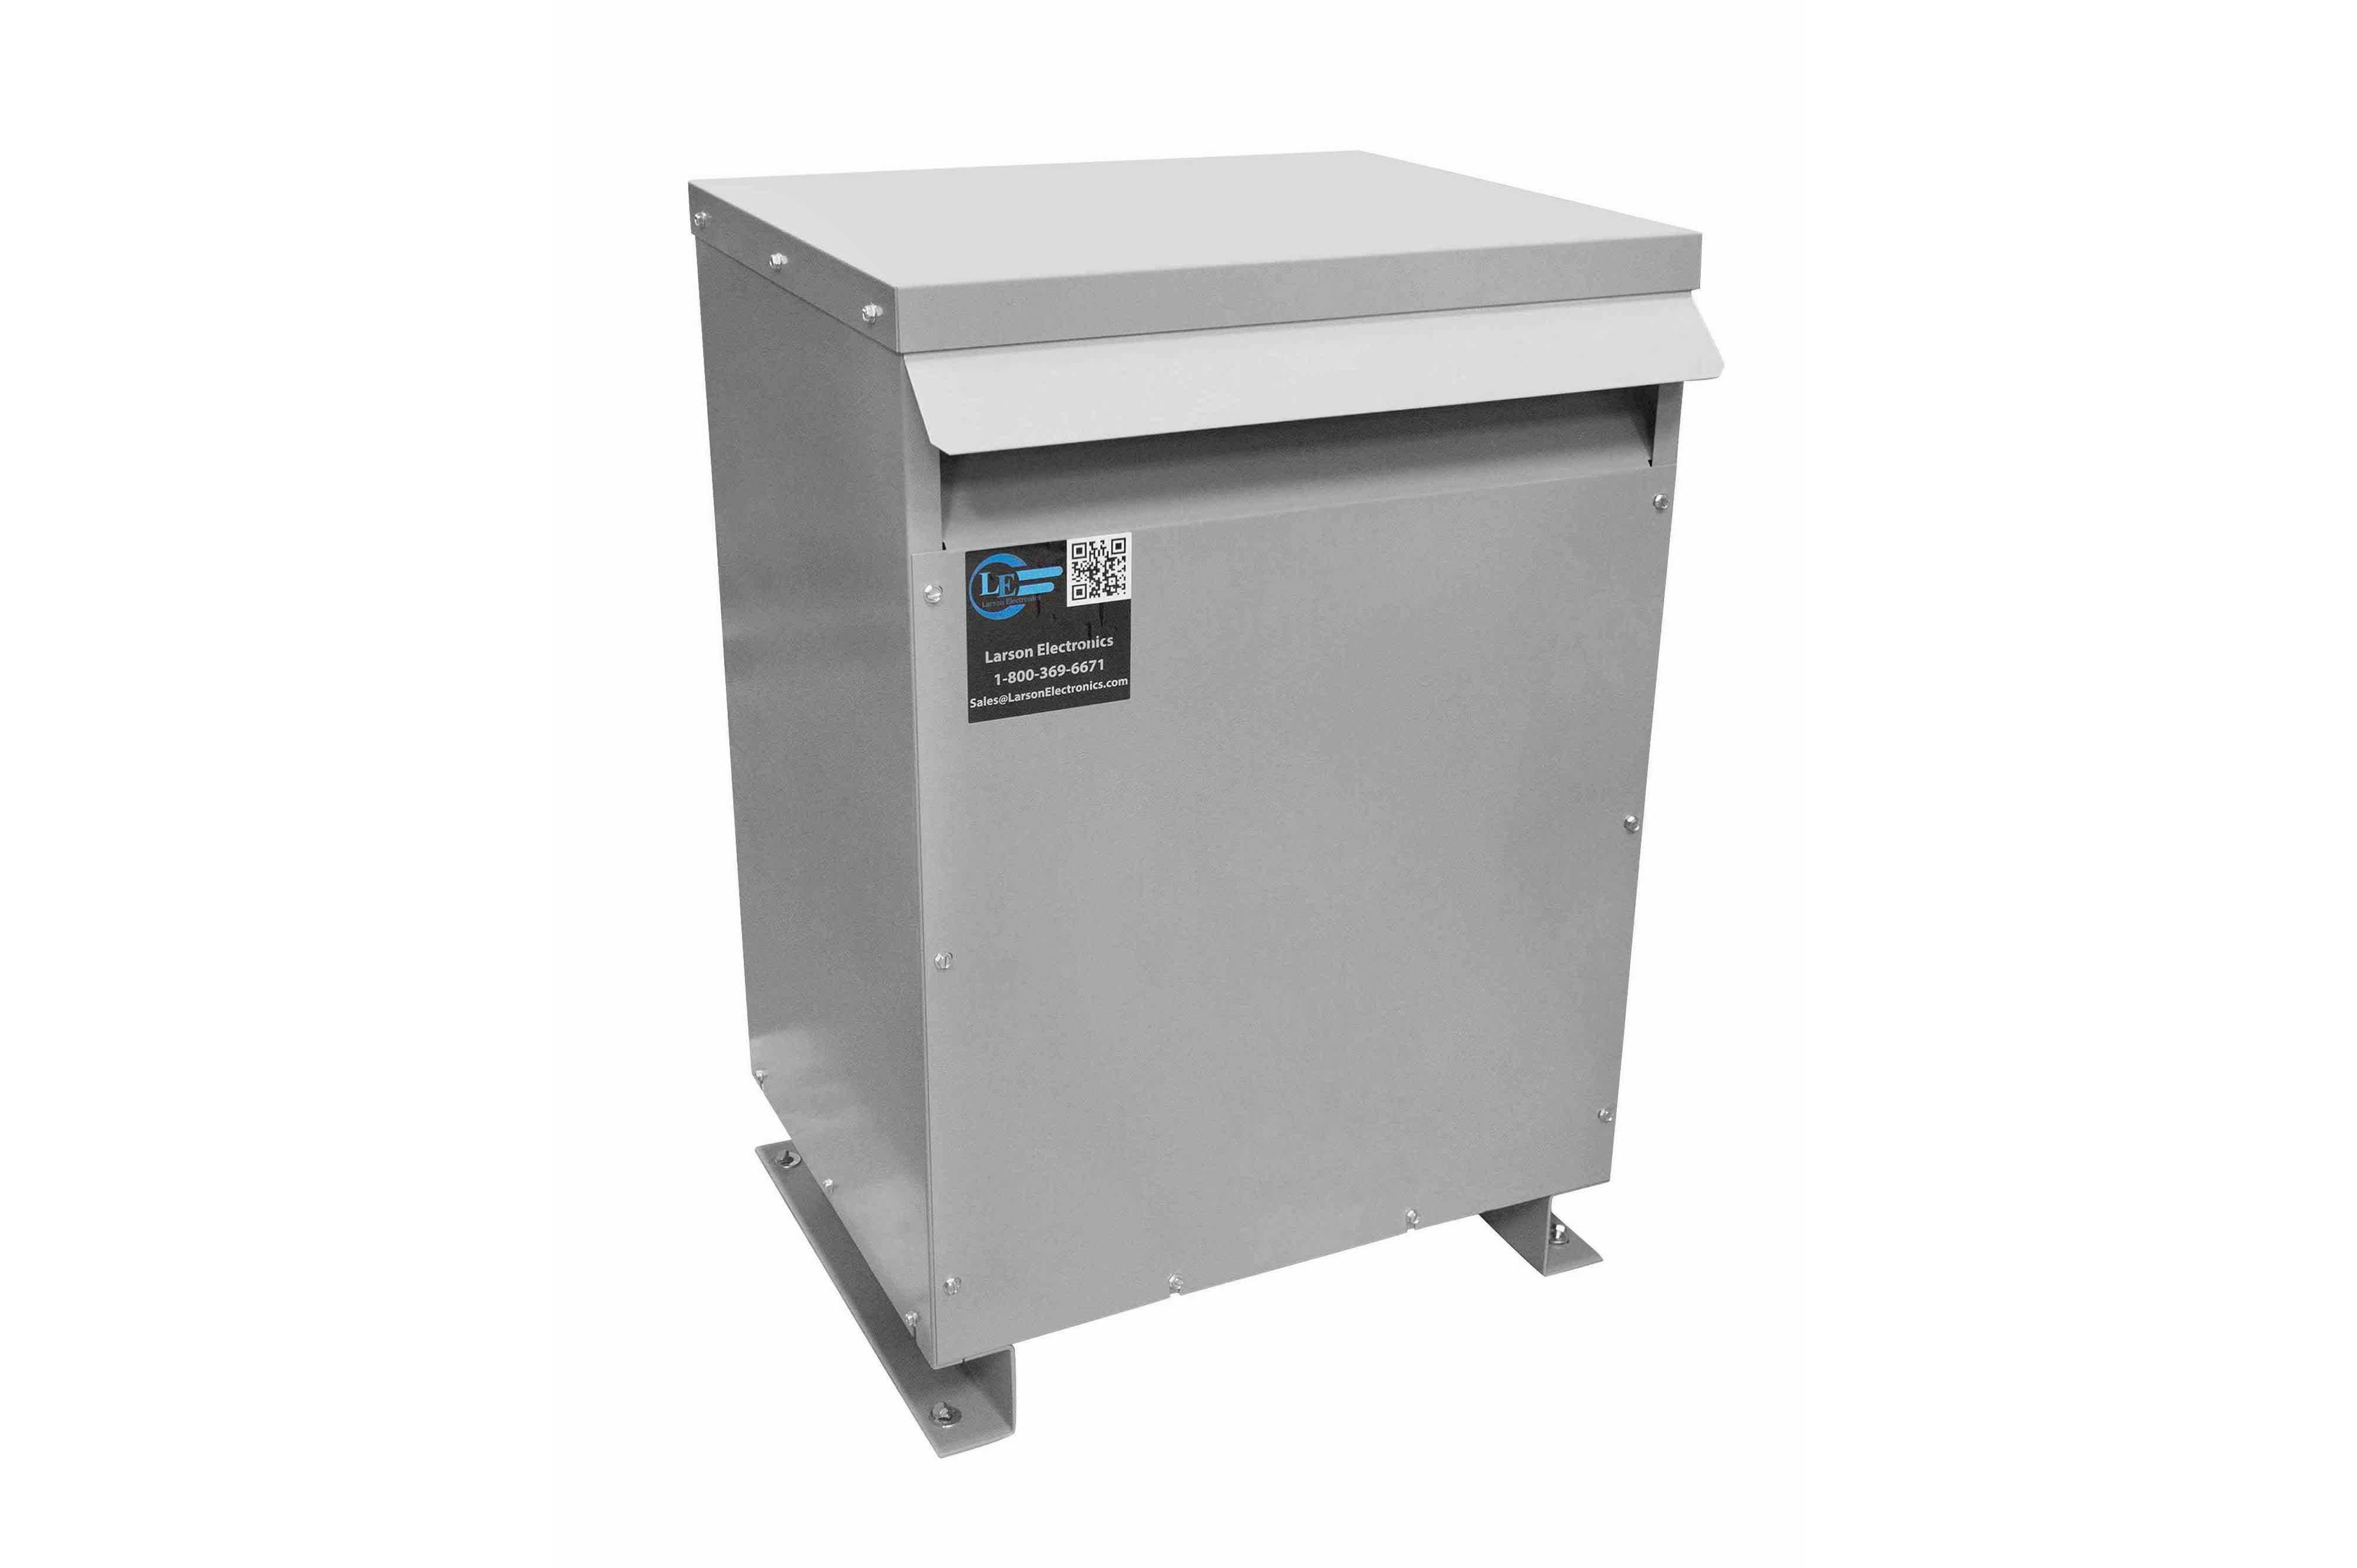 800 kVA 3PH Isolation Transformer, 600V Wye Primary, 400Y/231 Wye-N Secondary, N3R, Ventilated, 60 Hz